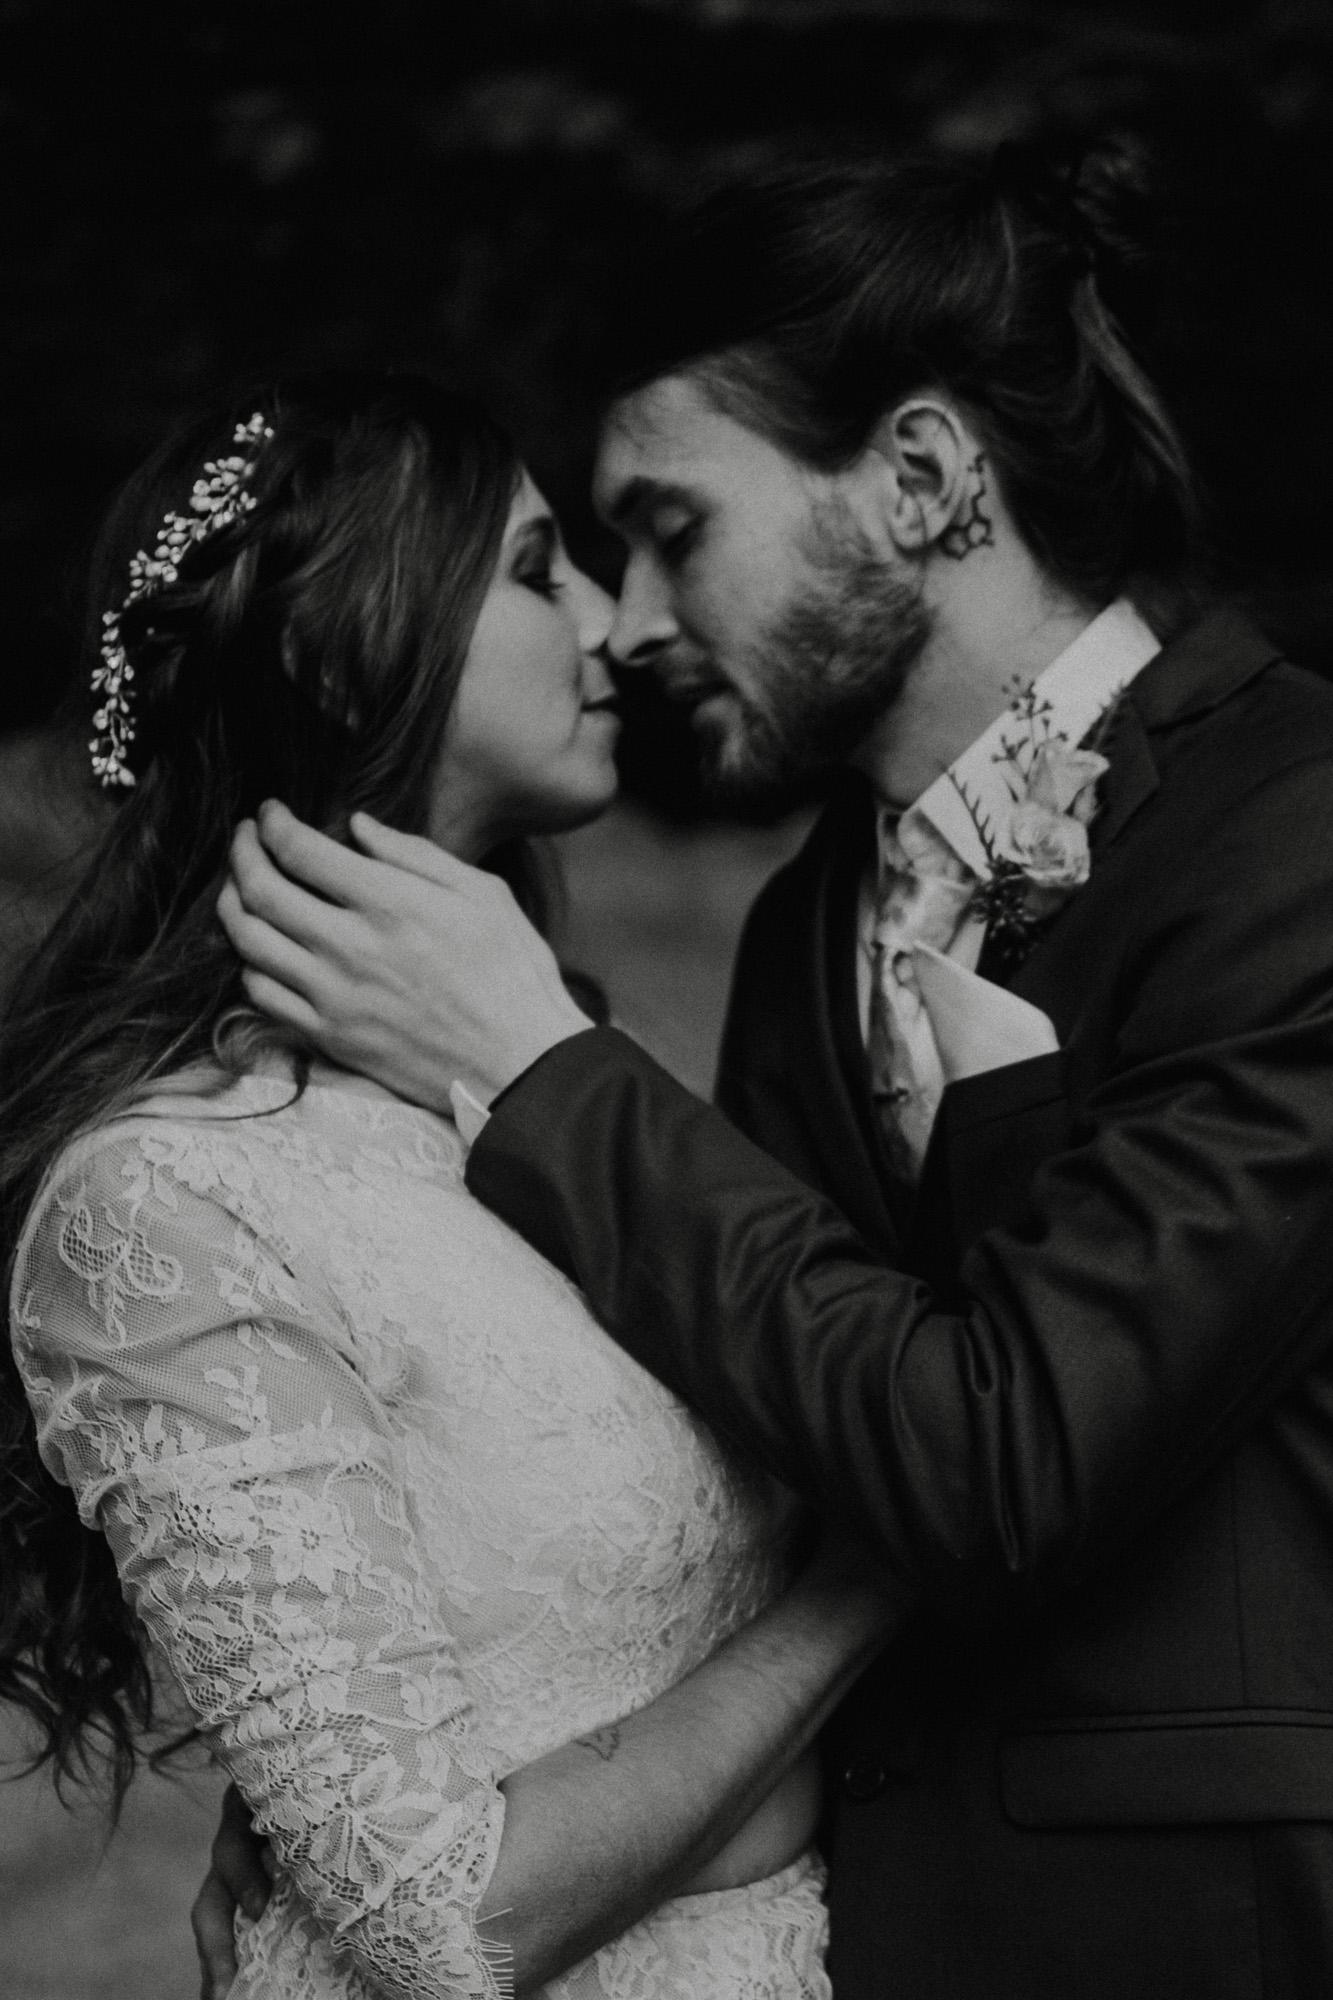 Cate_Ann_Photography_Dayton_Ohio_Wedding_Elopement_And_Engagement_PhotographerDSC_5966-3.jpg